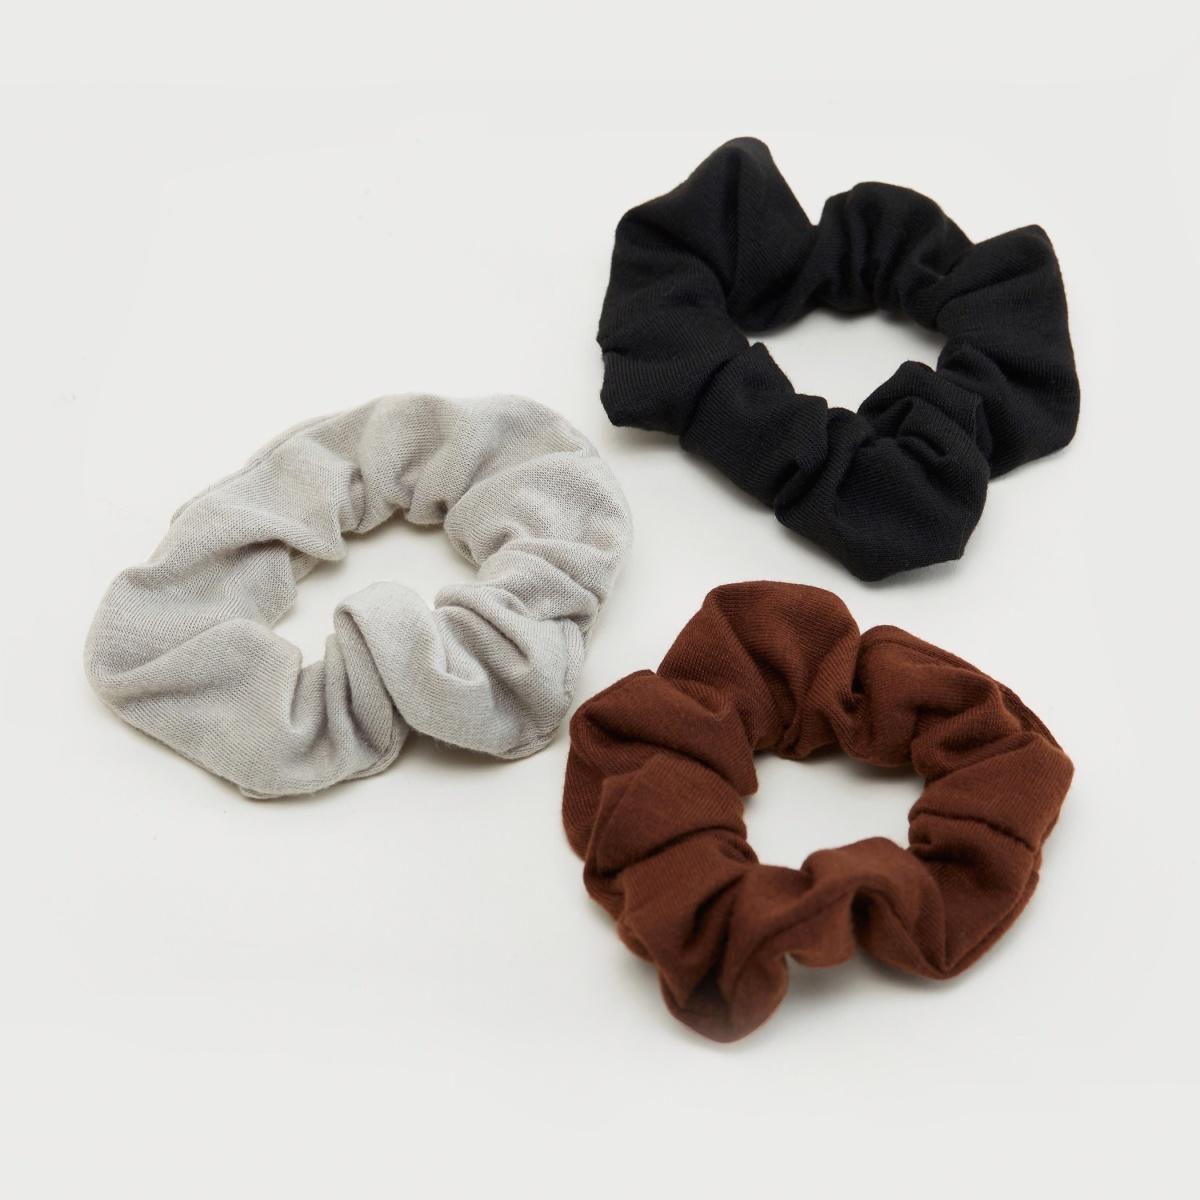 Assorted scrunchies